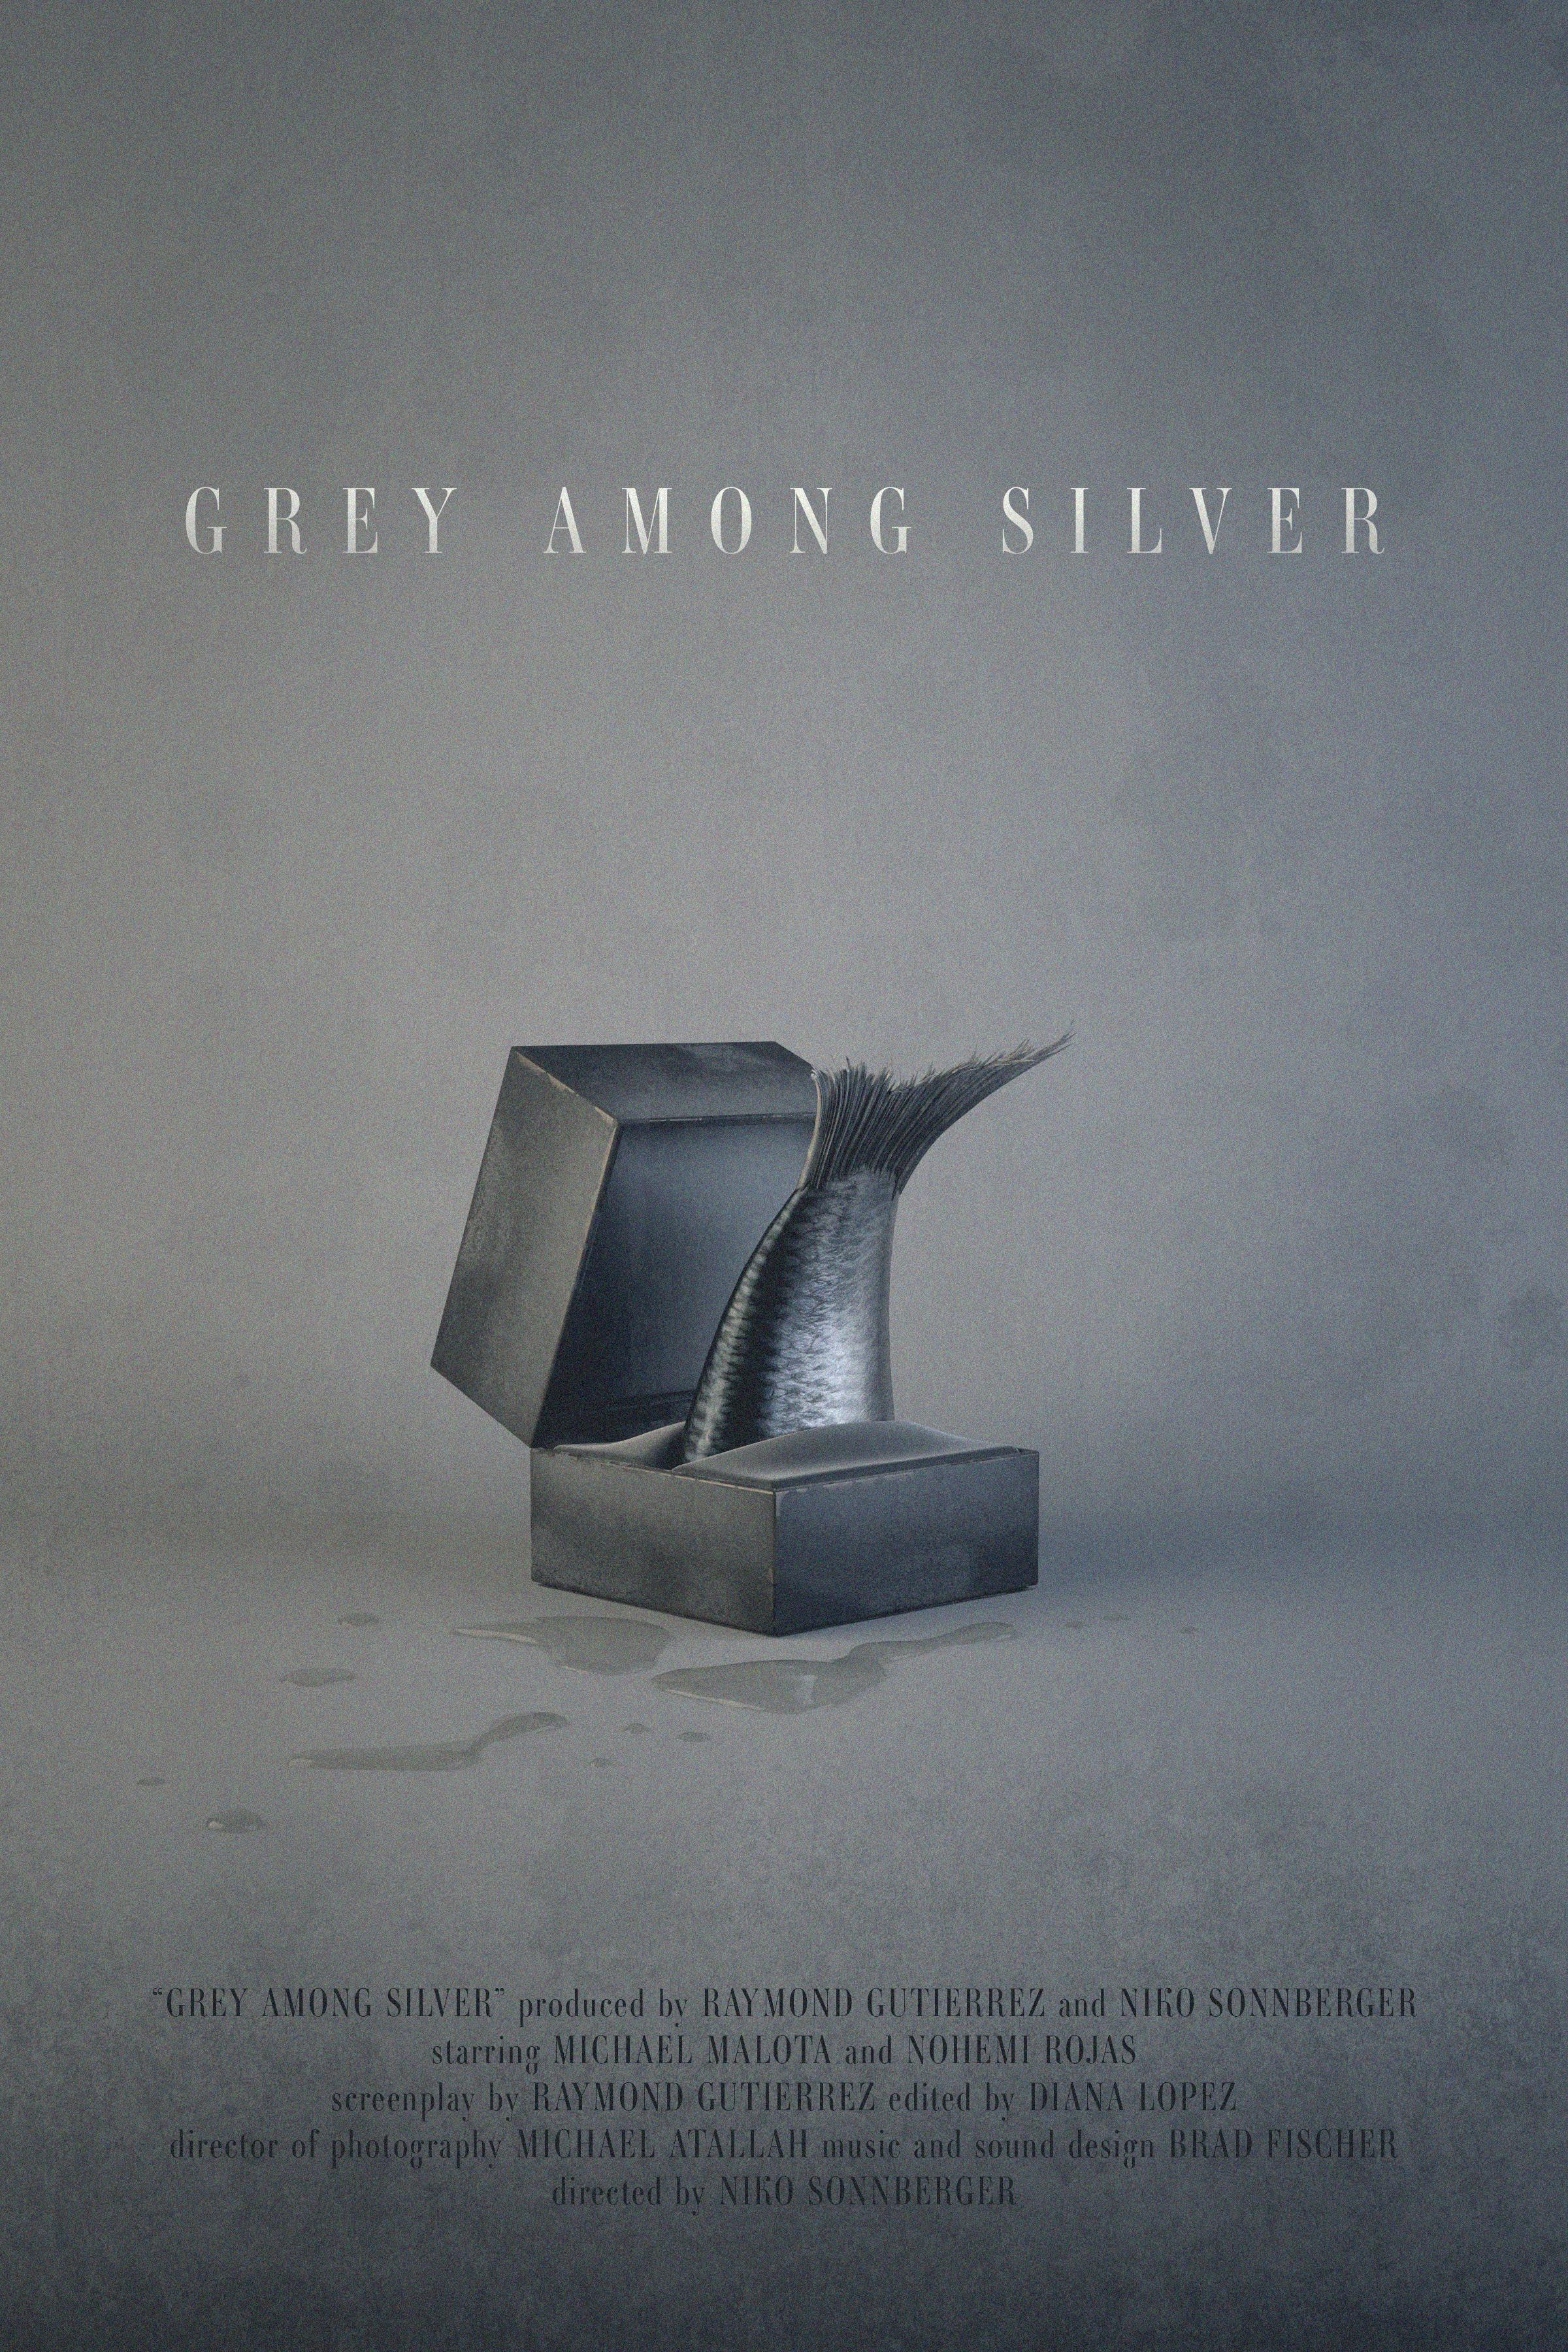 GREY AMONG SILVER Film Poster Final 5.31.19.jpg